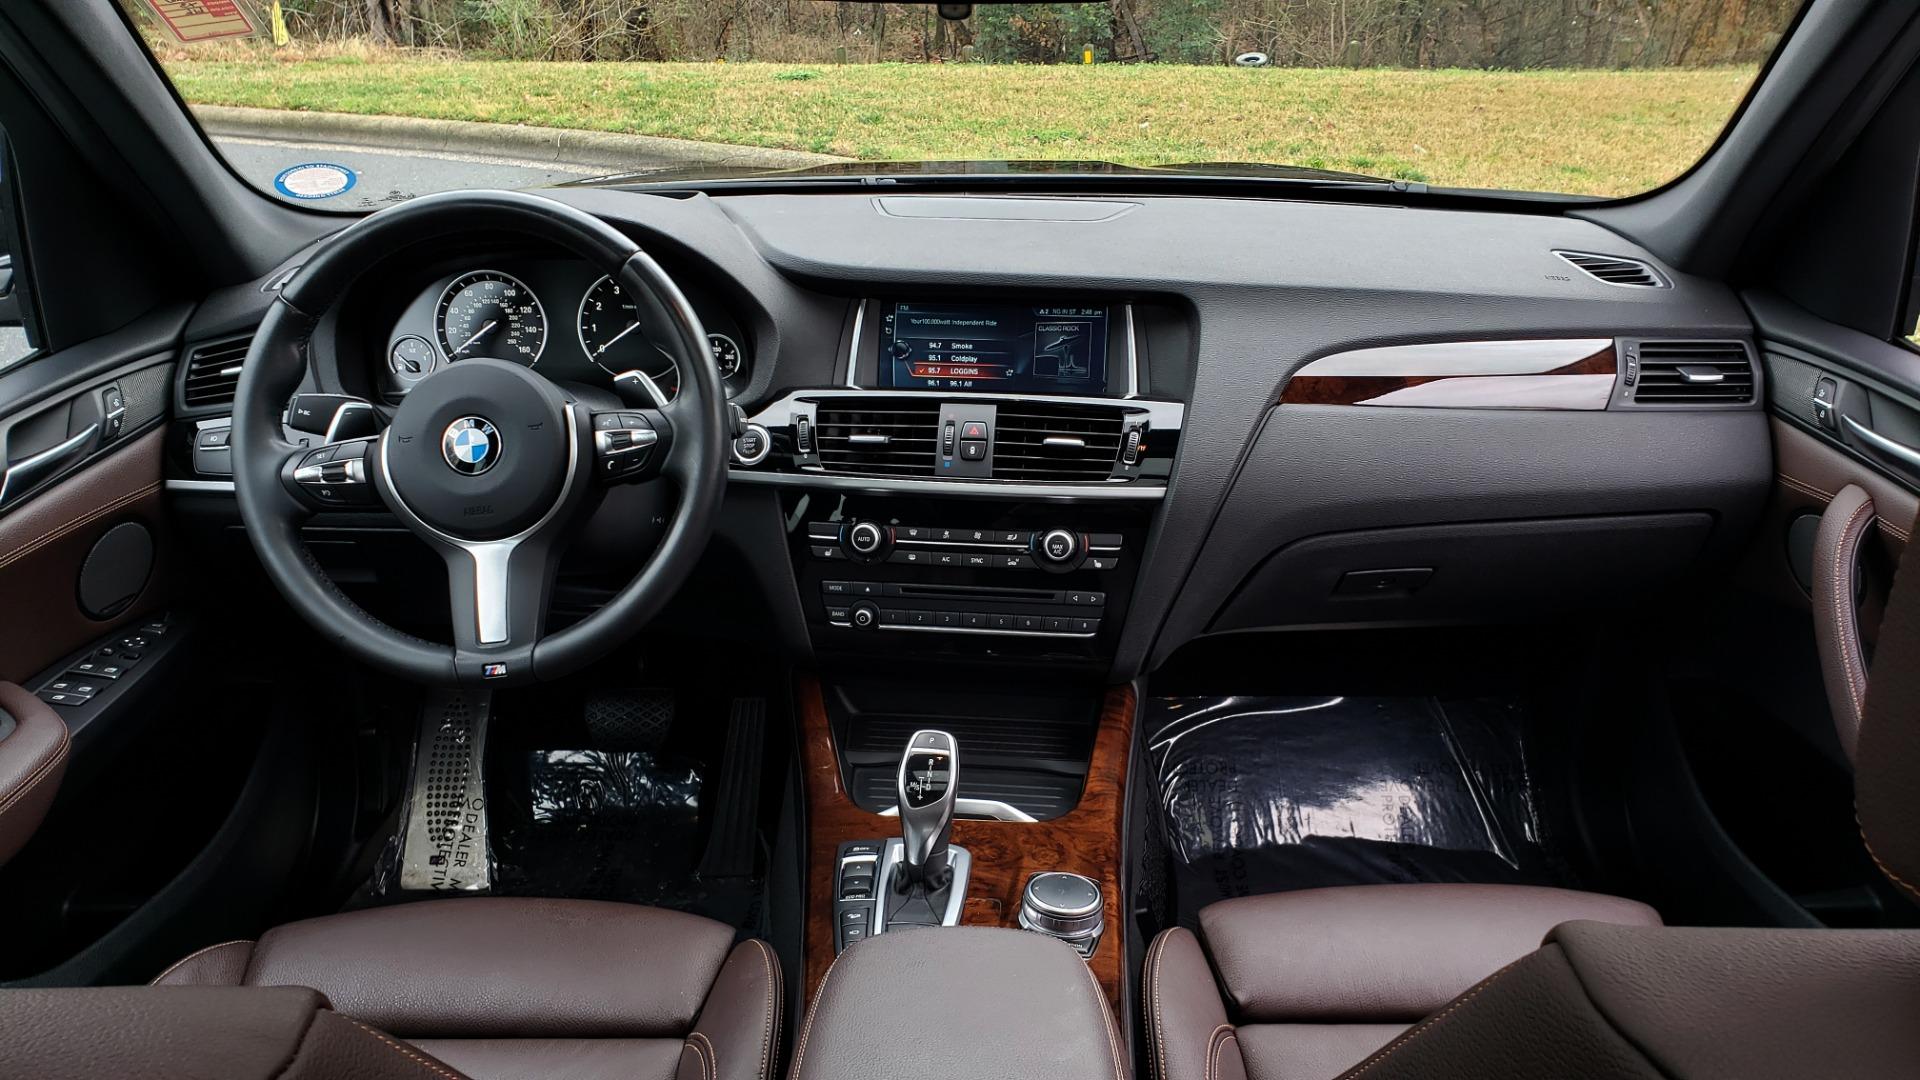 Used 2017 BMW X3 XDRIVE35I M-SPORT / DRVR ASST PLUS / TECHNOLOGY / HUD / BLIND SPOT for sale Sold at Formula Imports in Charlotte NC 28227 73